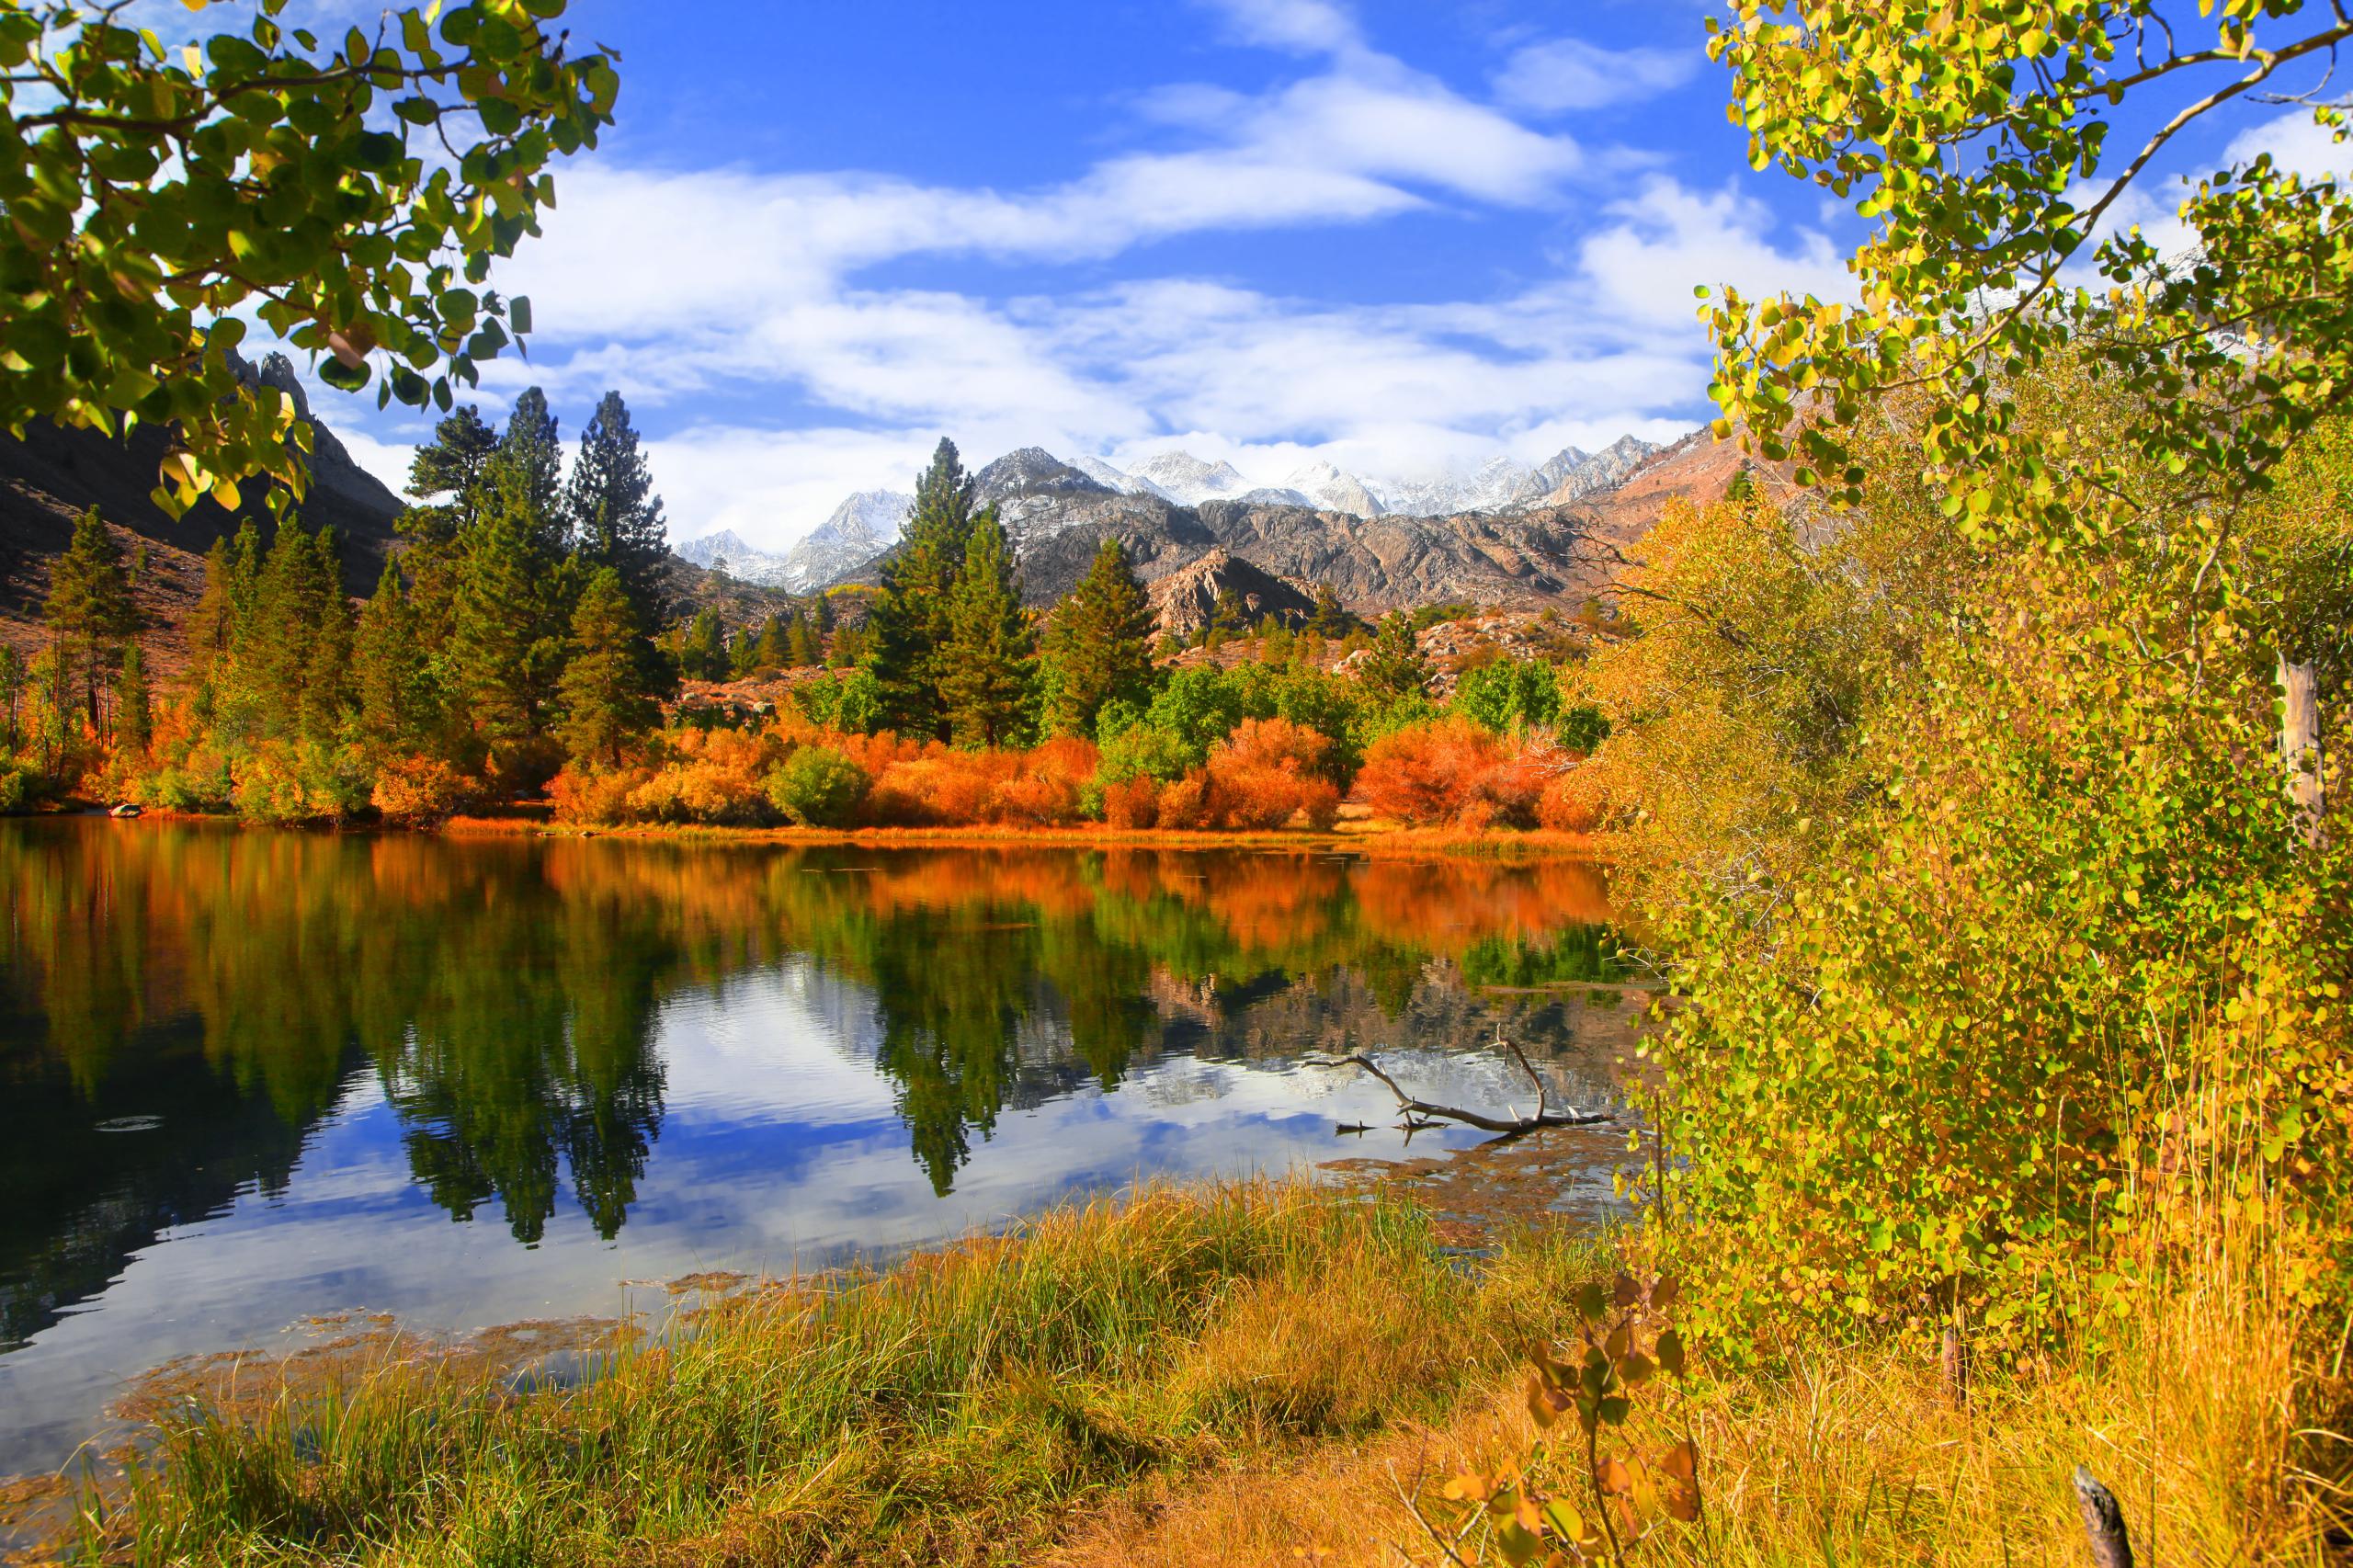 The Eastern Sierra Scenic Byway Road Trip